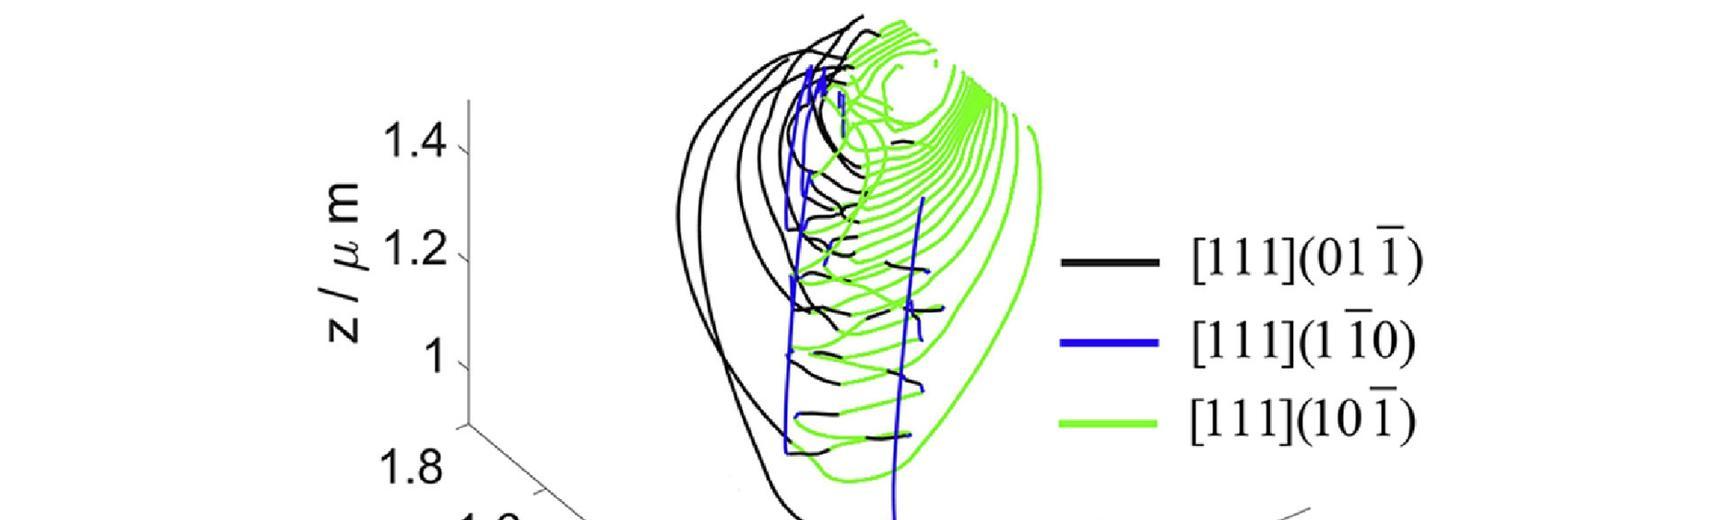 nanoindent ddd prismatic loops